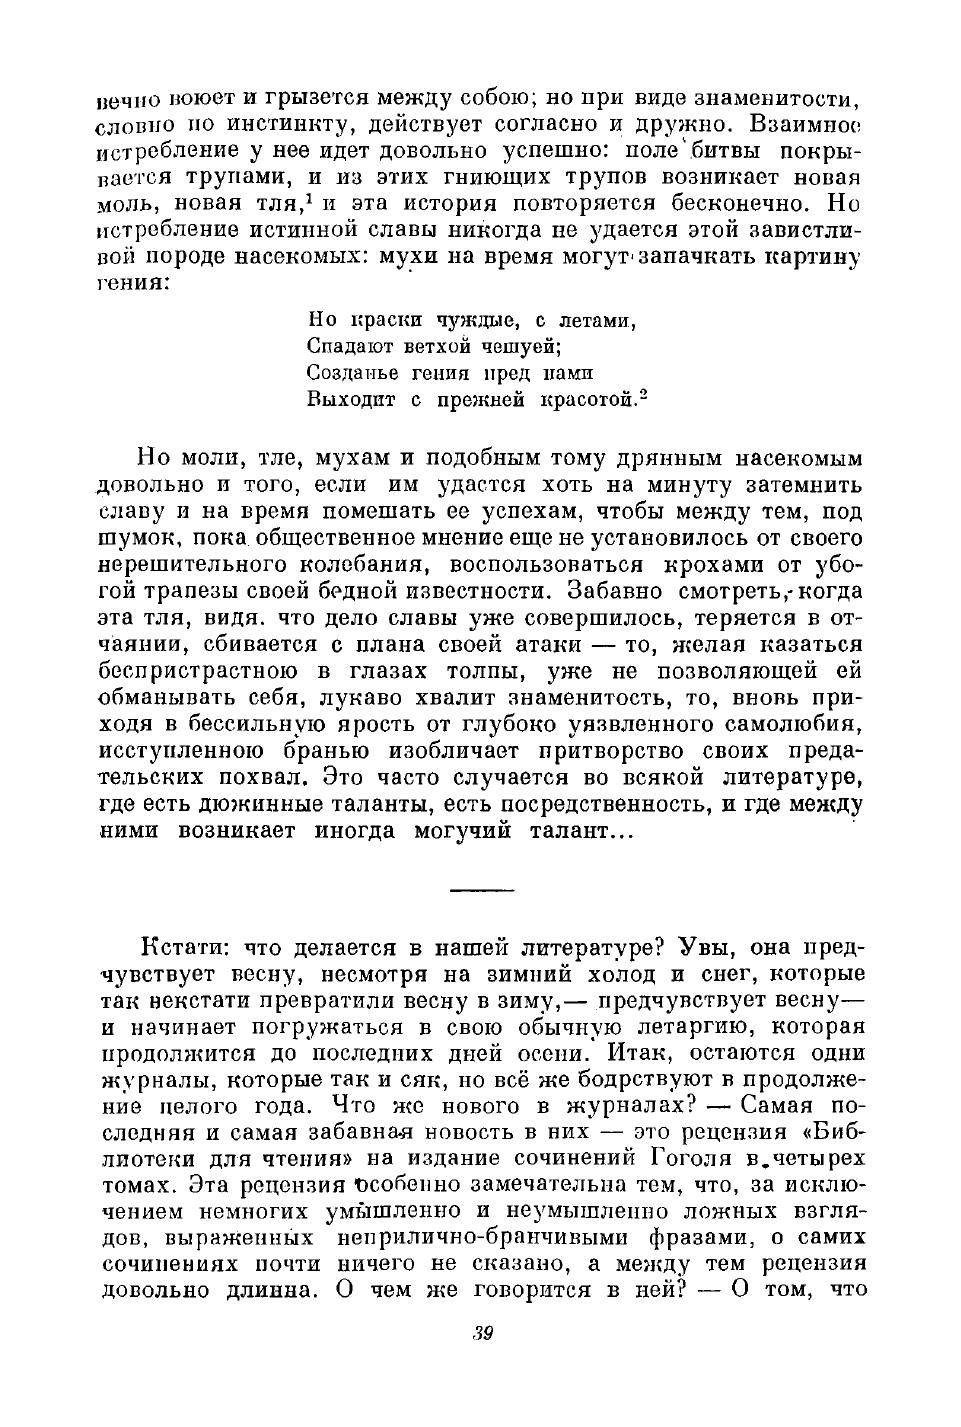 http://images.vfl.ru/ii/1405933614/e44fe166/5764516.jpg